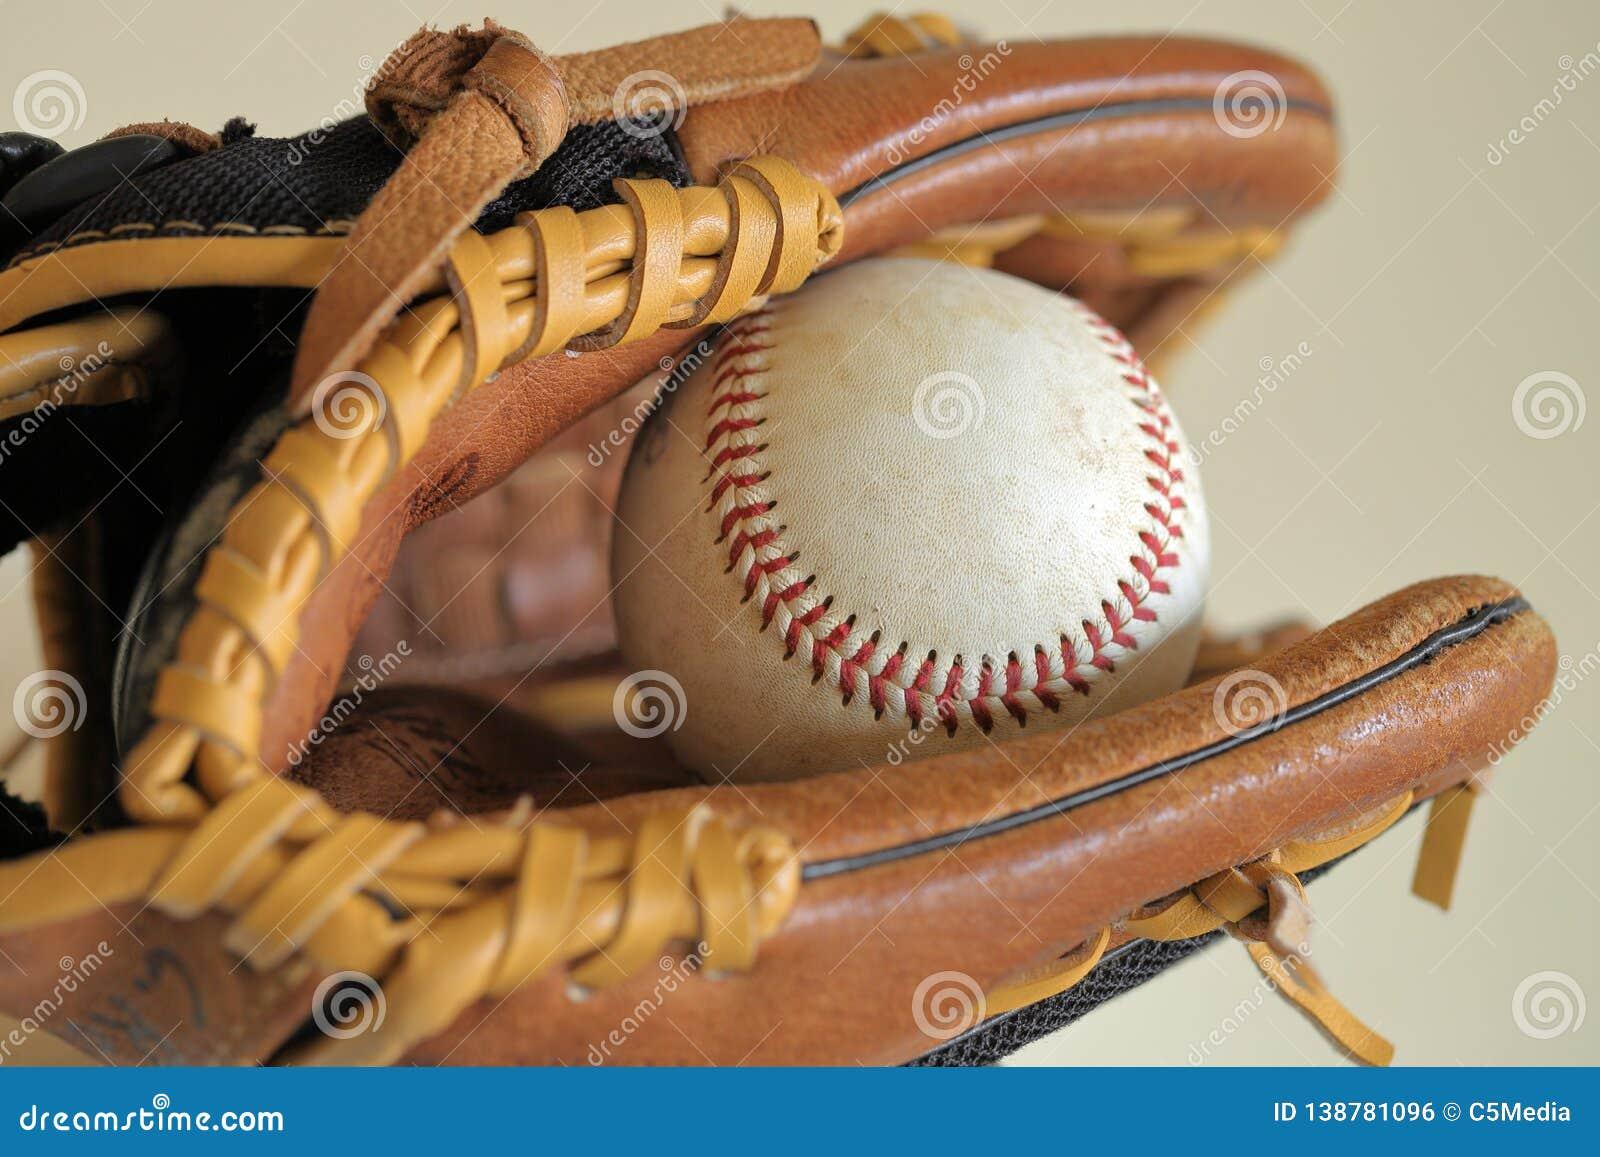 Baseball in leather glove - little league, sports